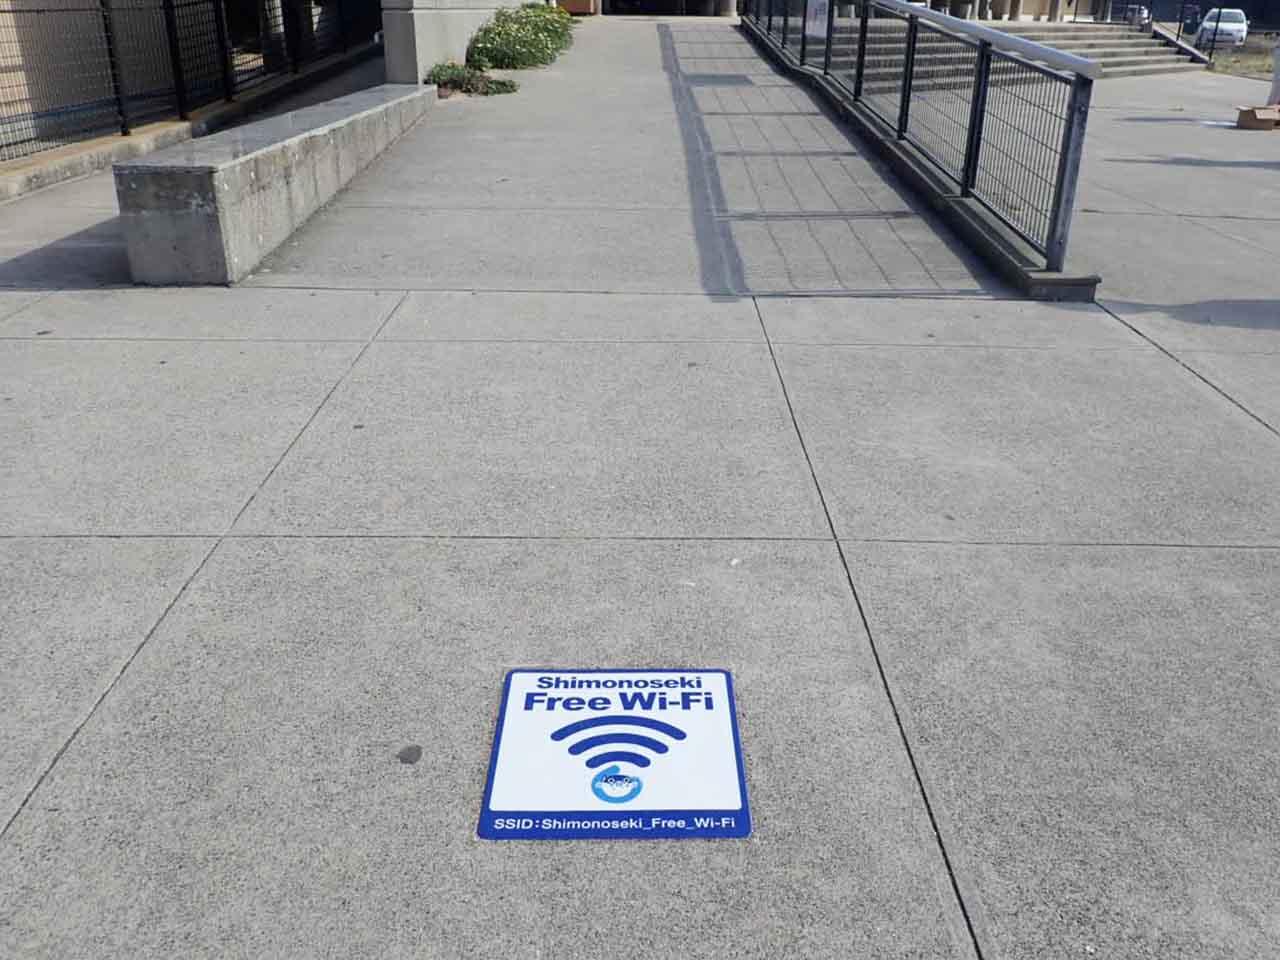 Shimonoseki  Free Wi-Fi